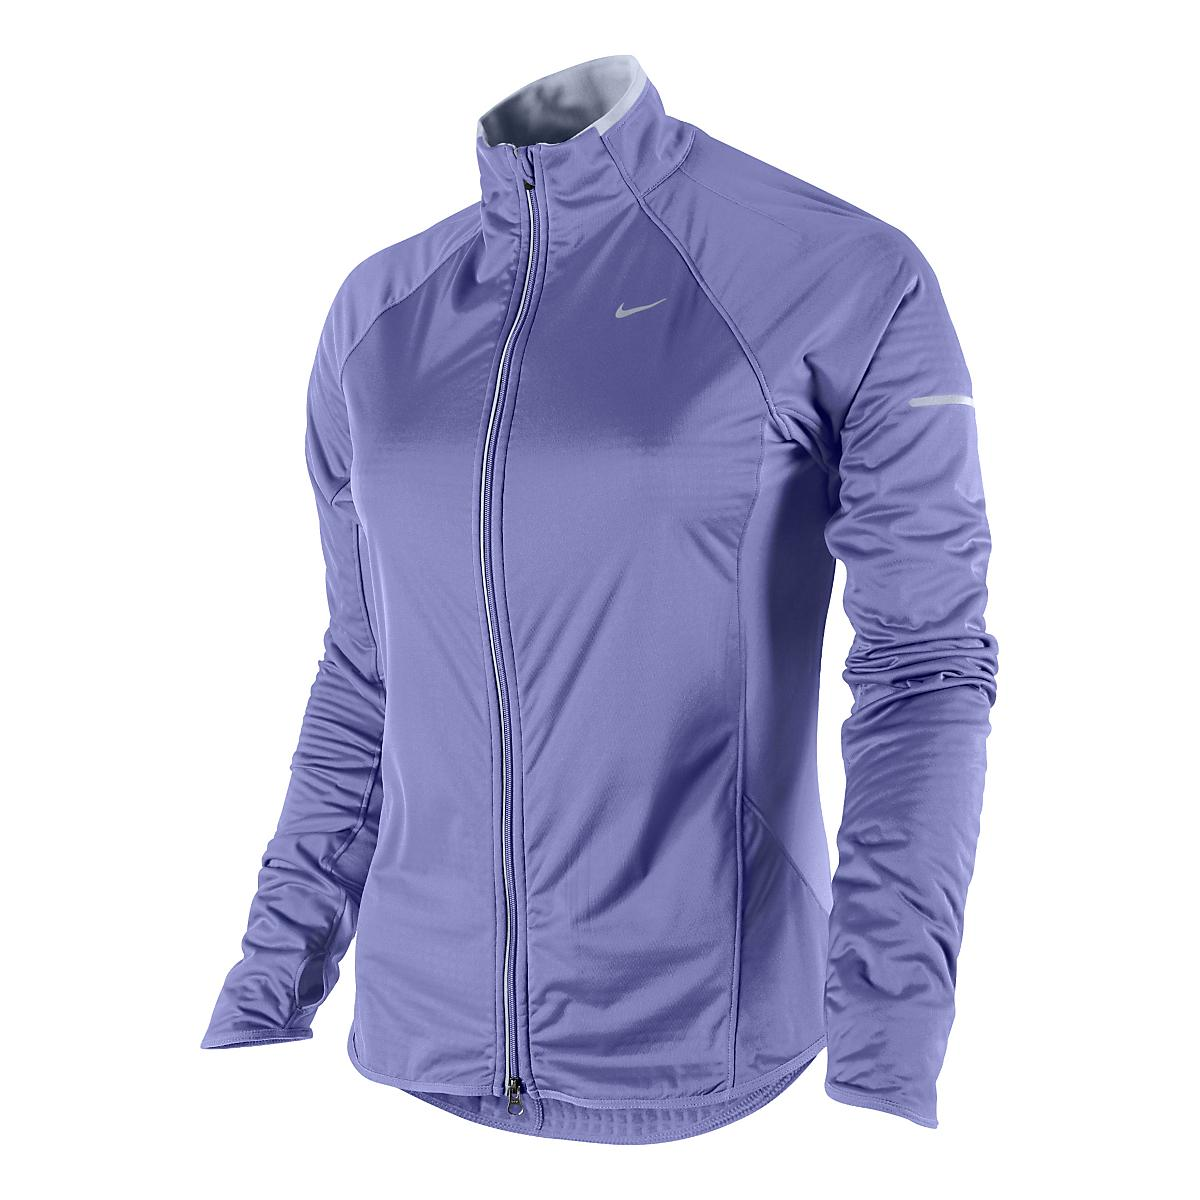 01bb3866faff Womens Nike Element Shield Full Zip Running Jackets at Road Runner Sports